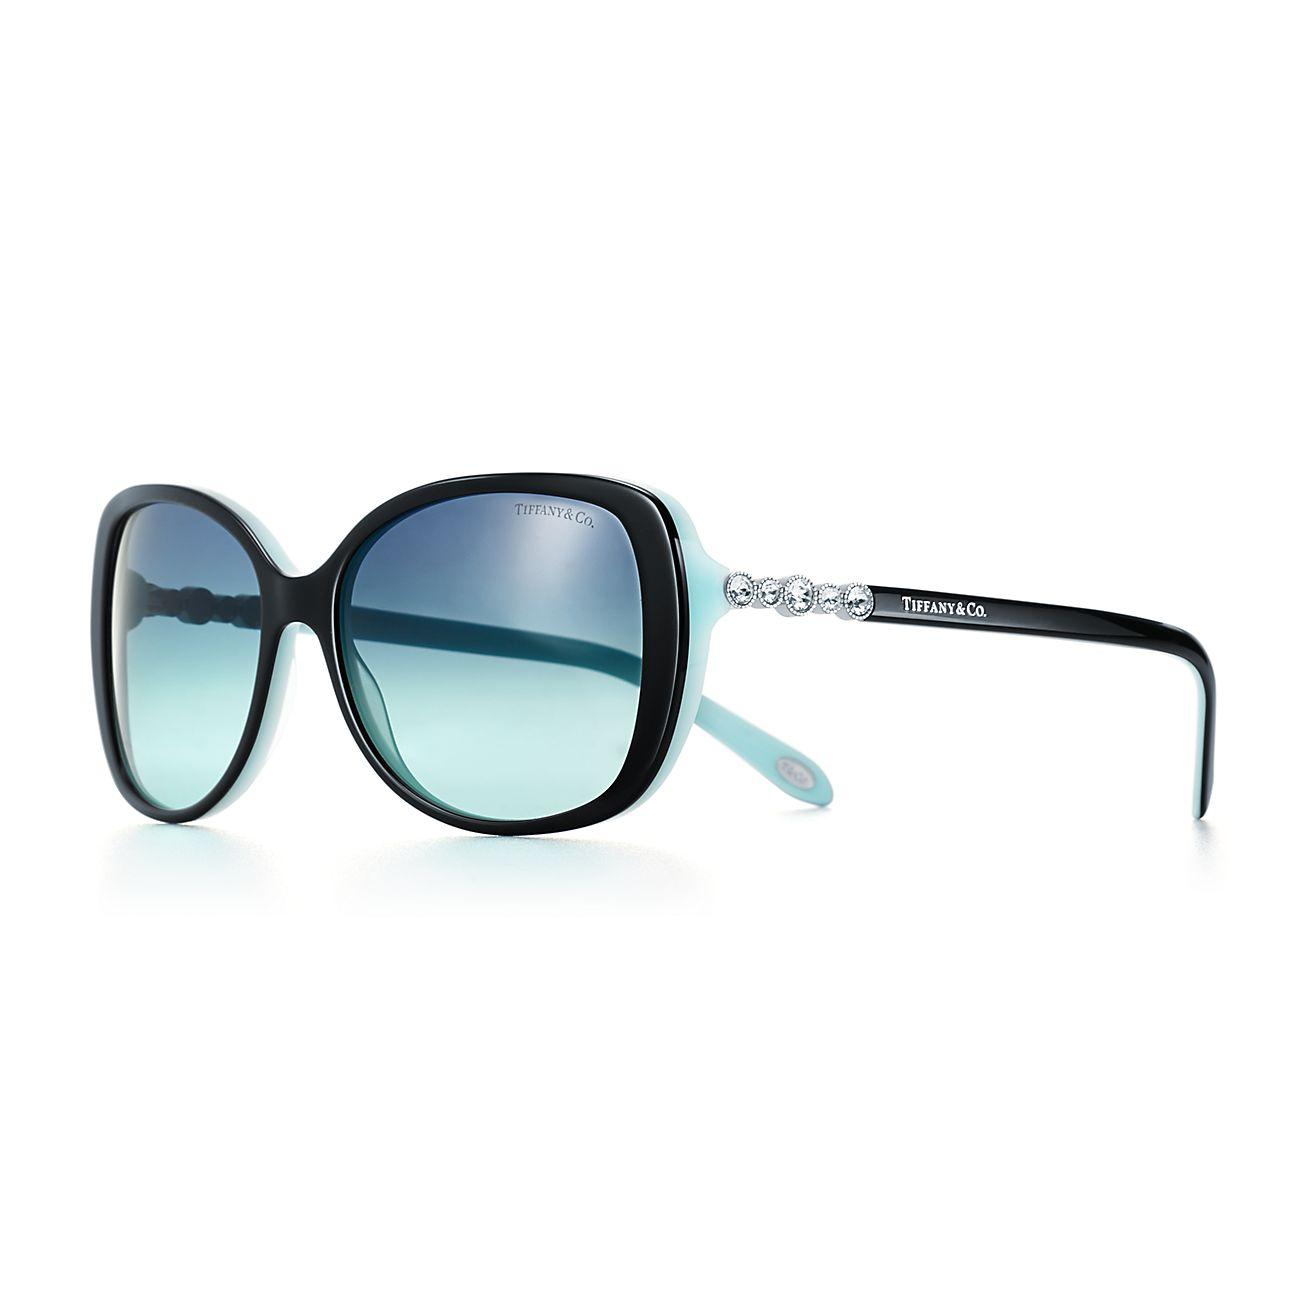 Tiffany Cobblestone rectangular sunglasses in black and ...